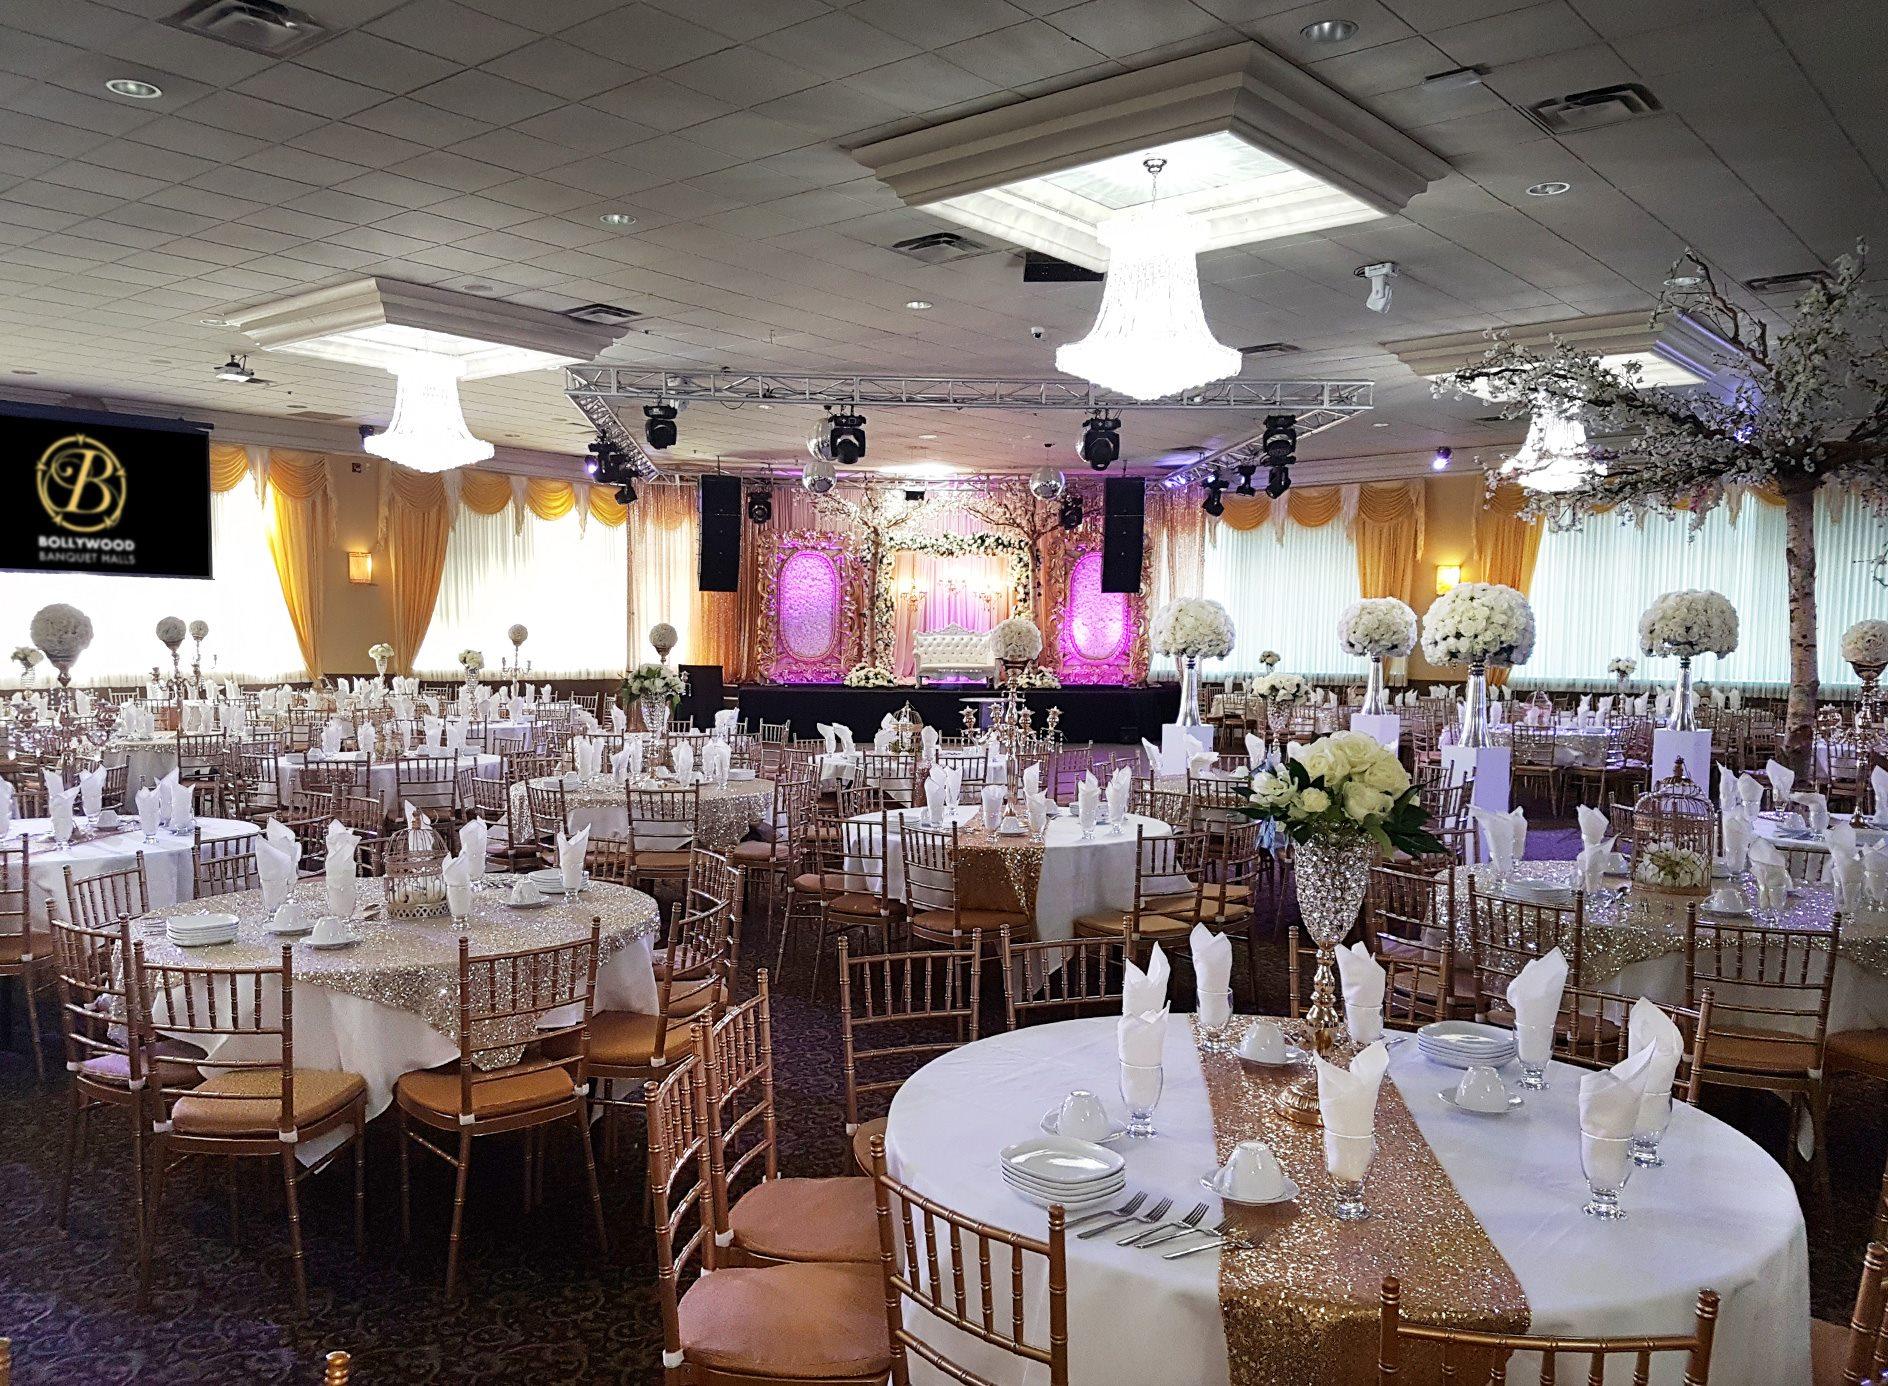 Bollywood Banquet Hall